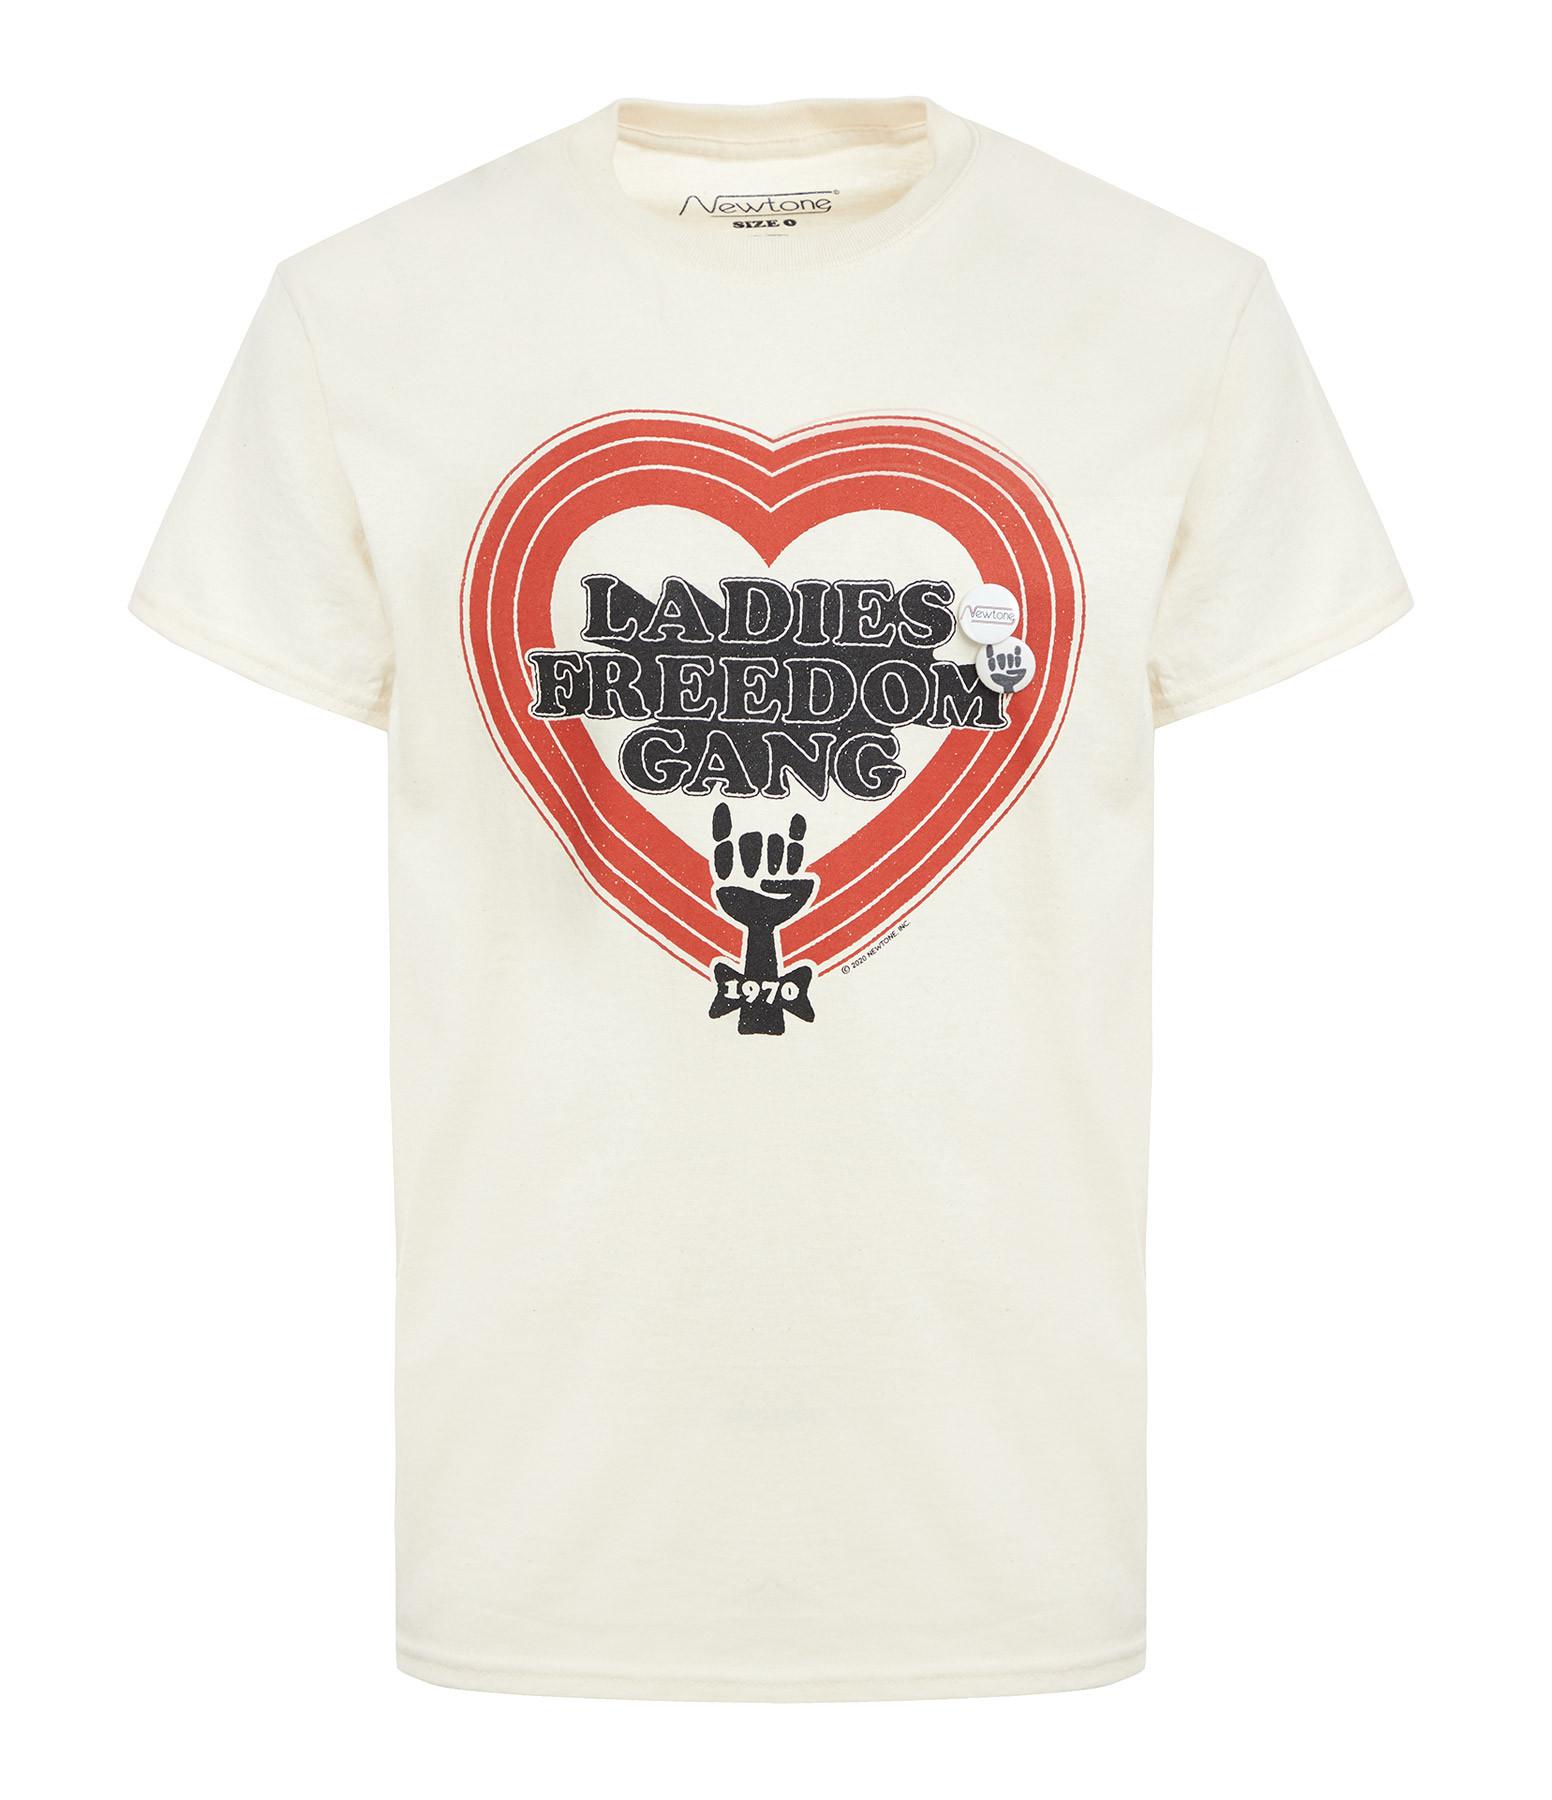 NEWTONE - Tee-shirt Trucker Freedom Coton Naturel